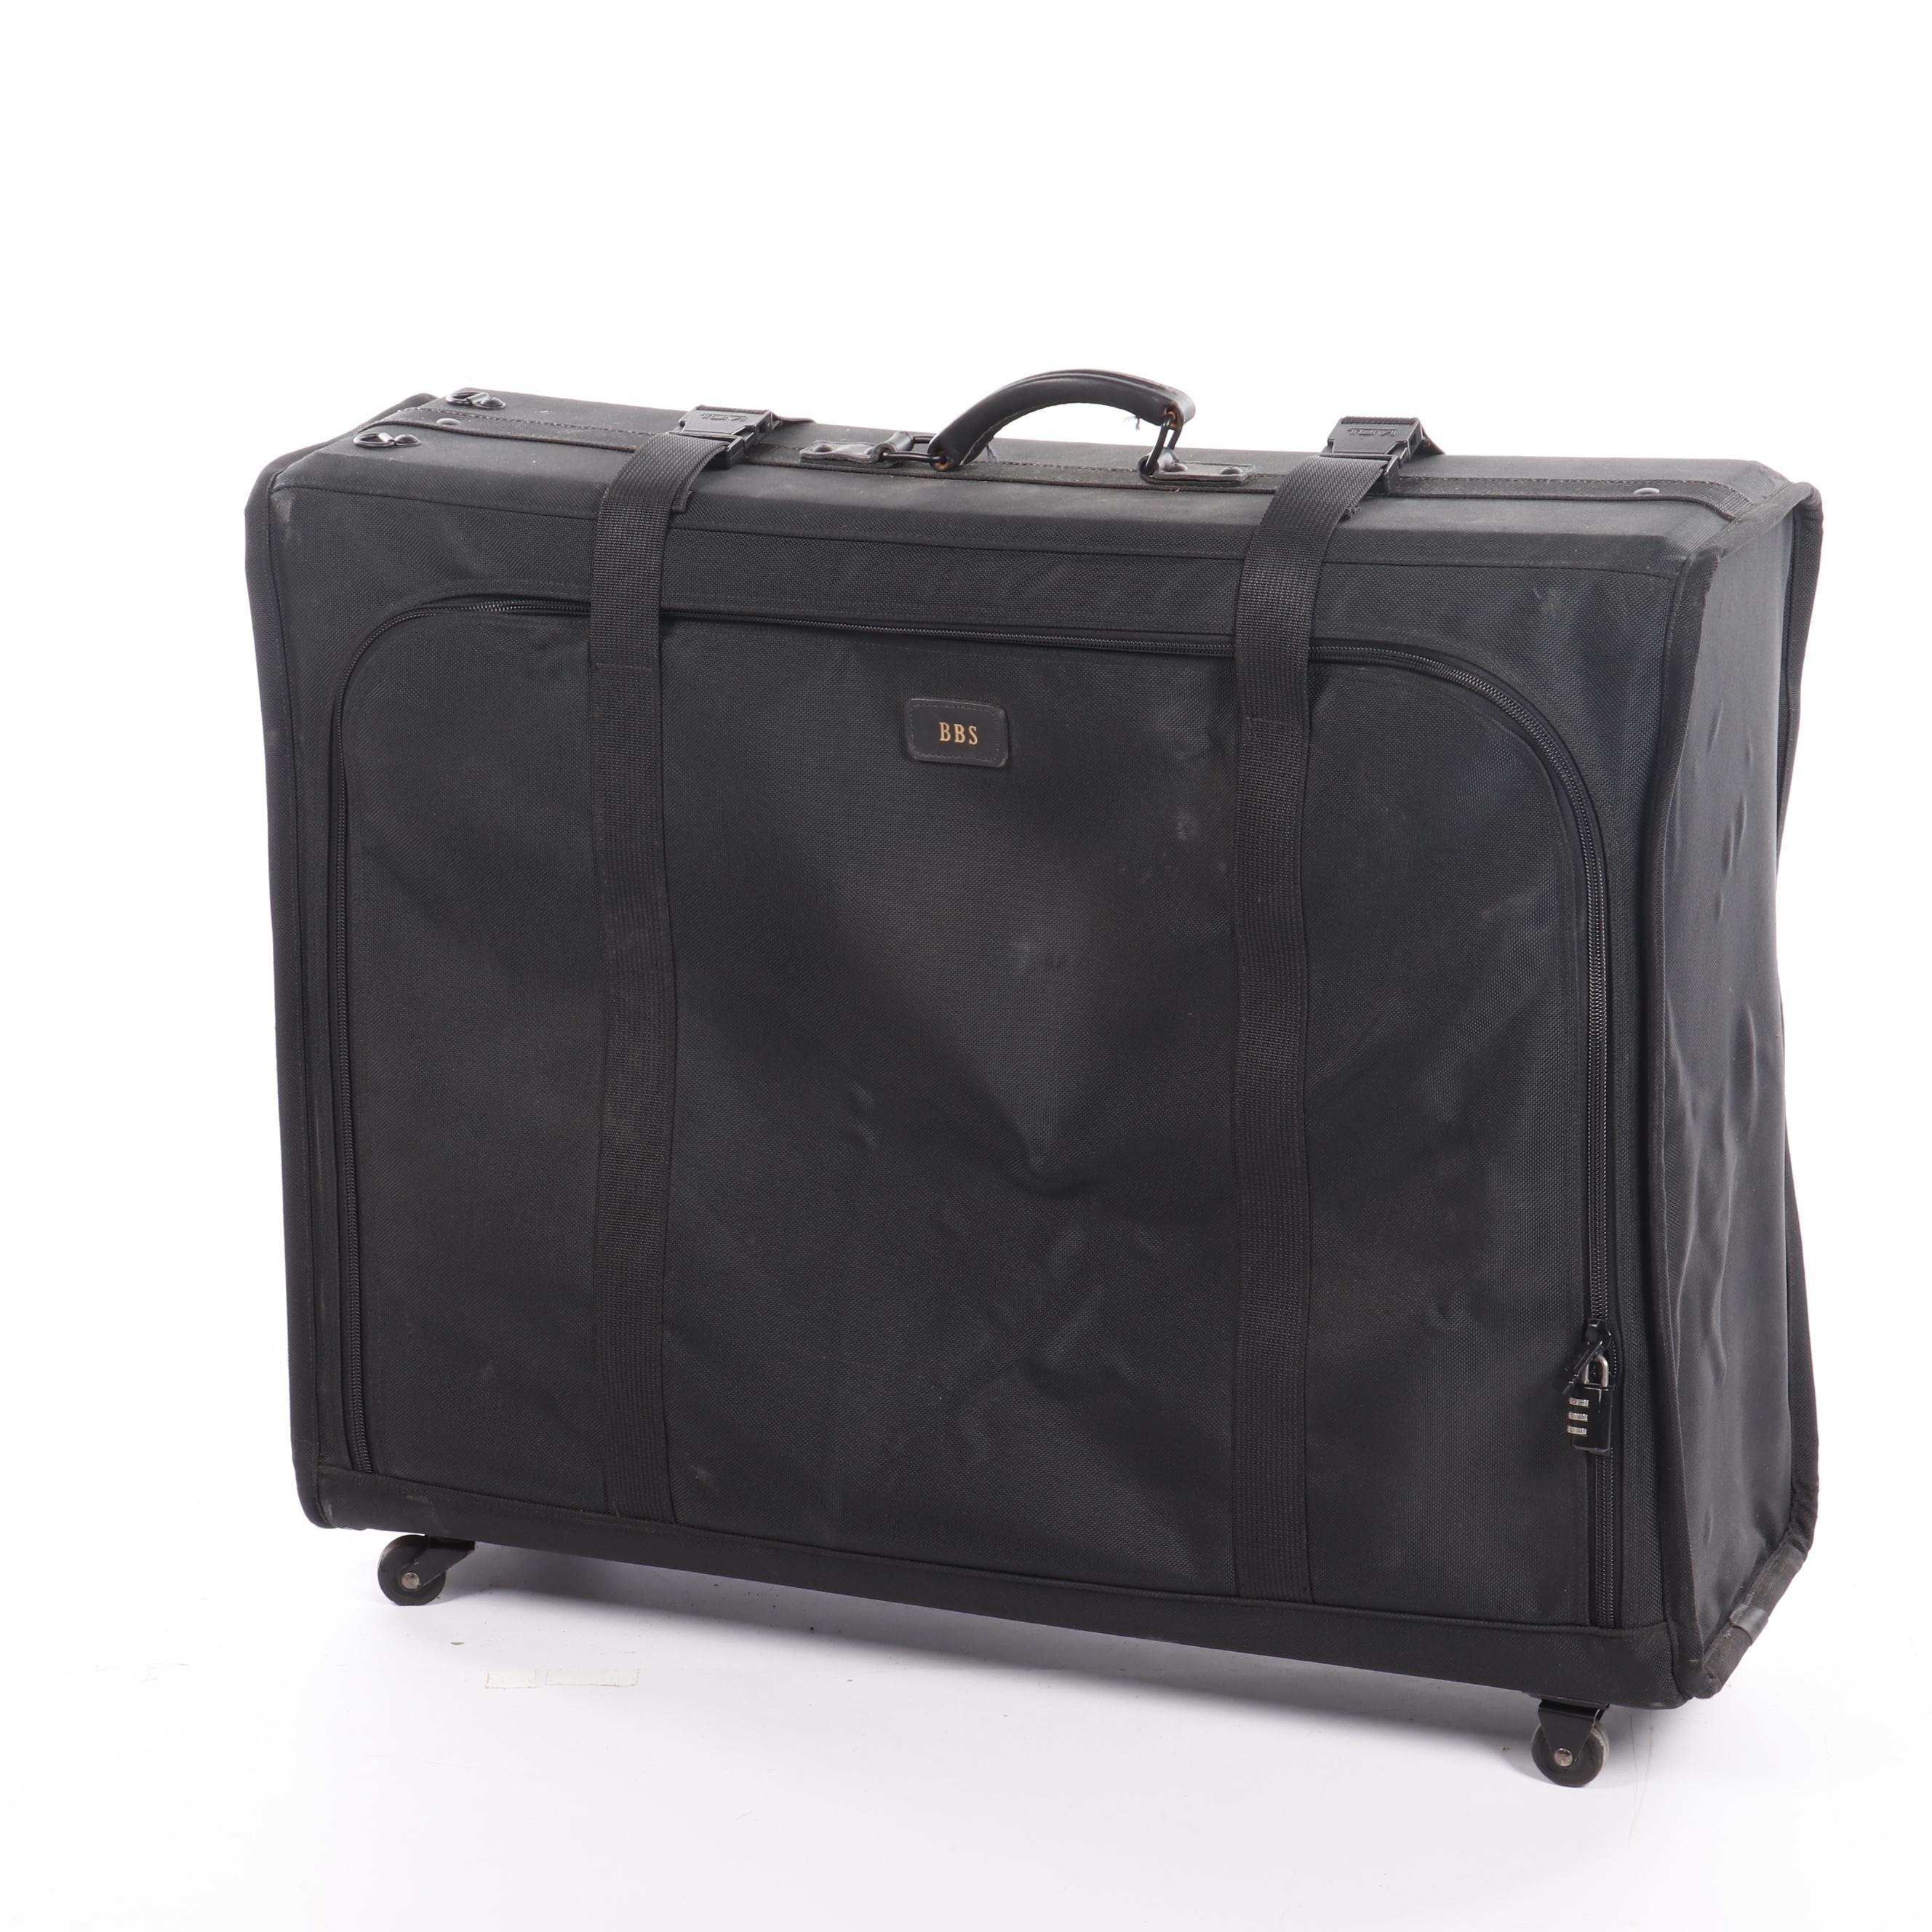 Tumi Black Nylon Rolling Suitcase